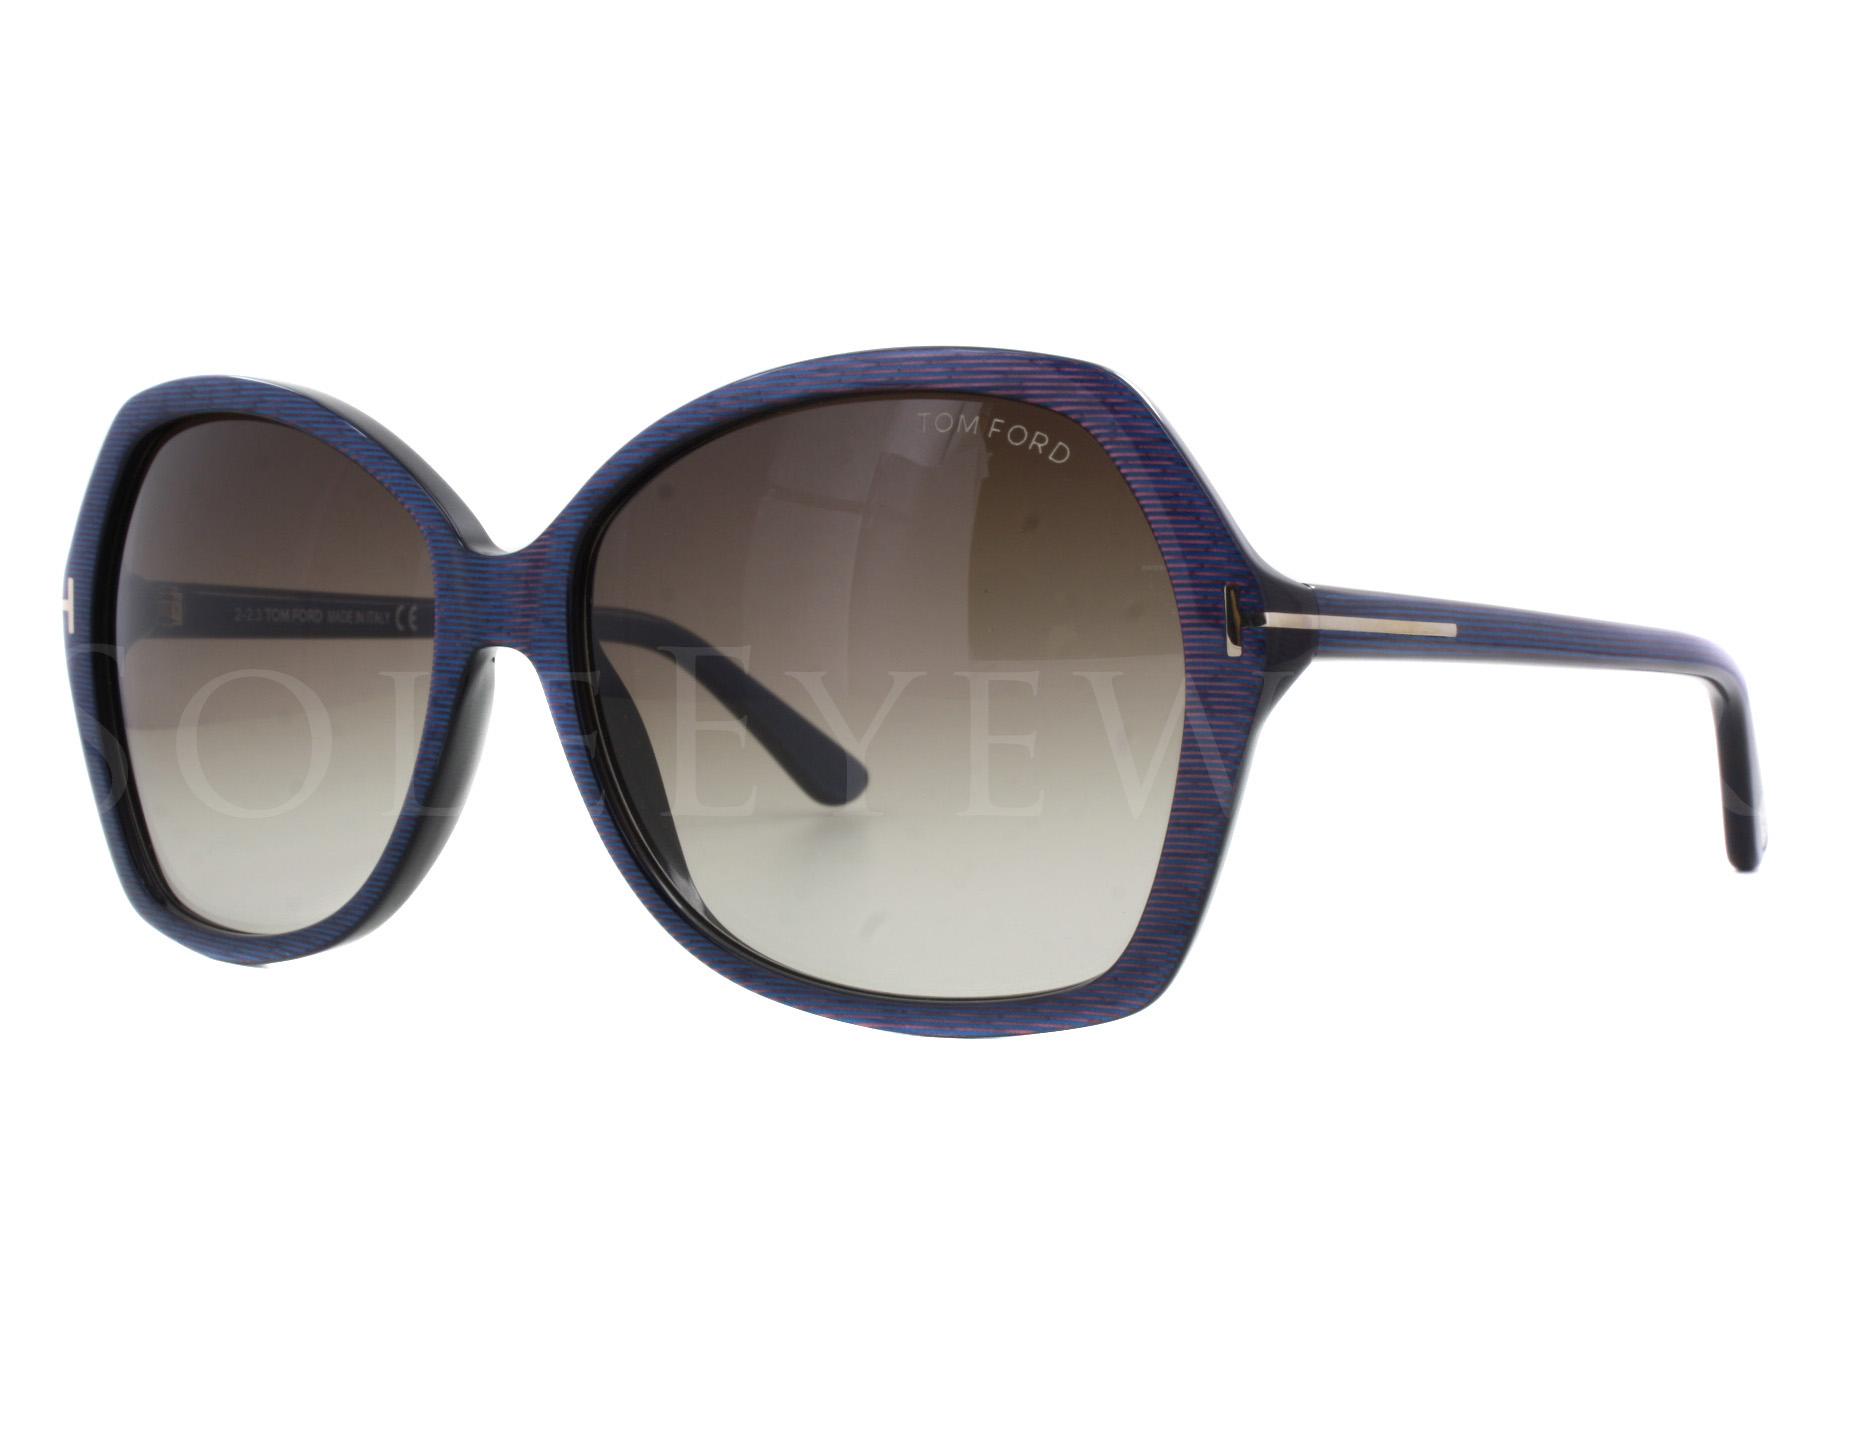 Sonnenbrille Carola (FT0328) Tom Ford GM5nX9Z